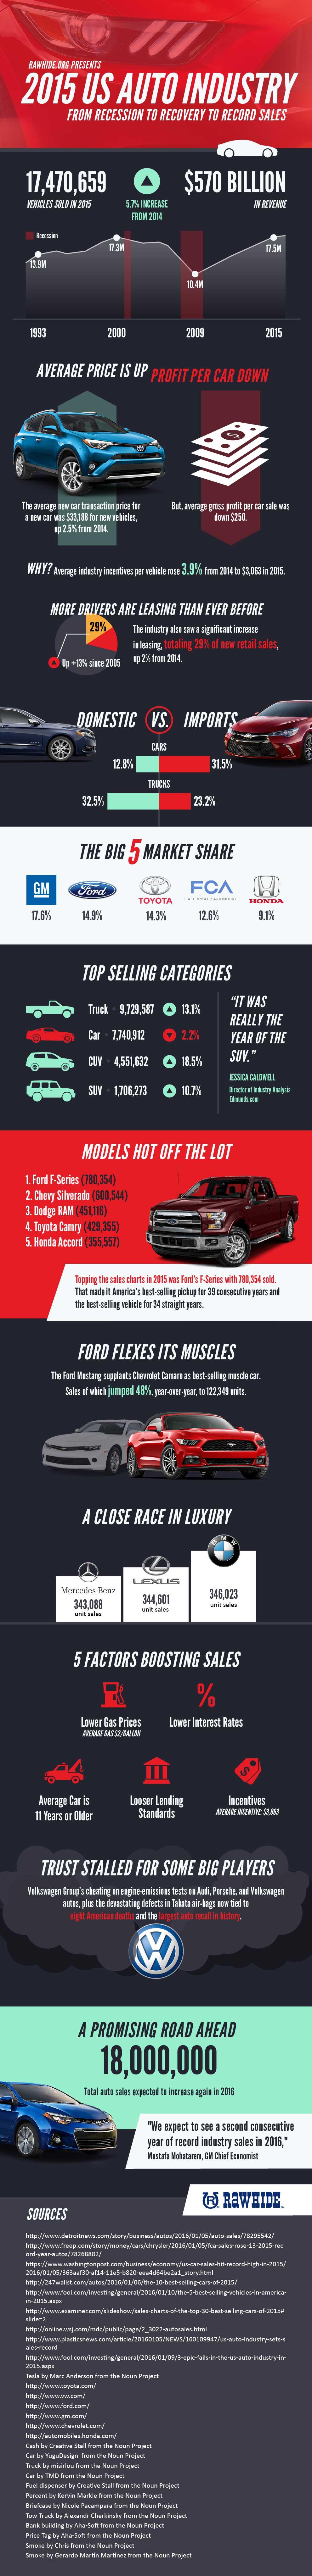 2015-AutoSales-Infographic